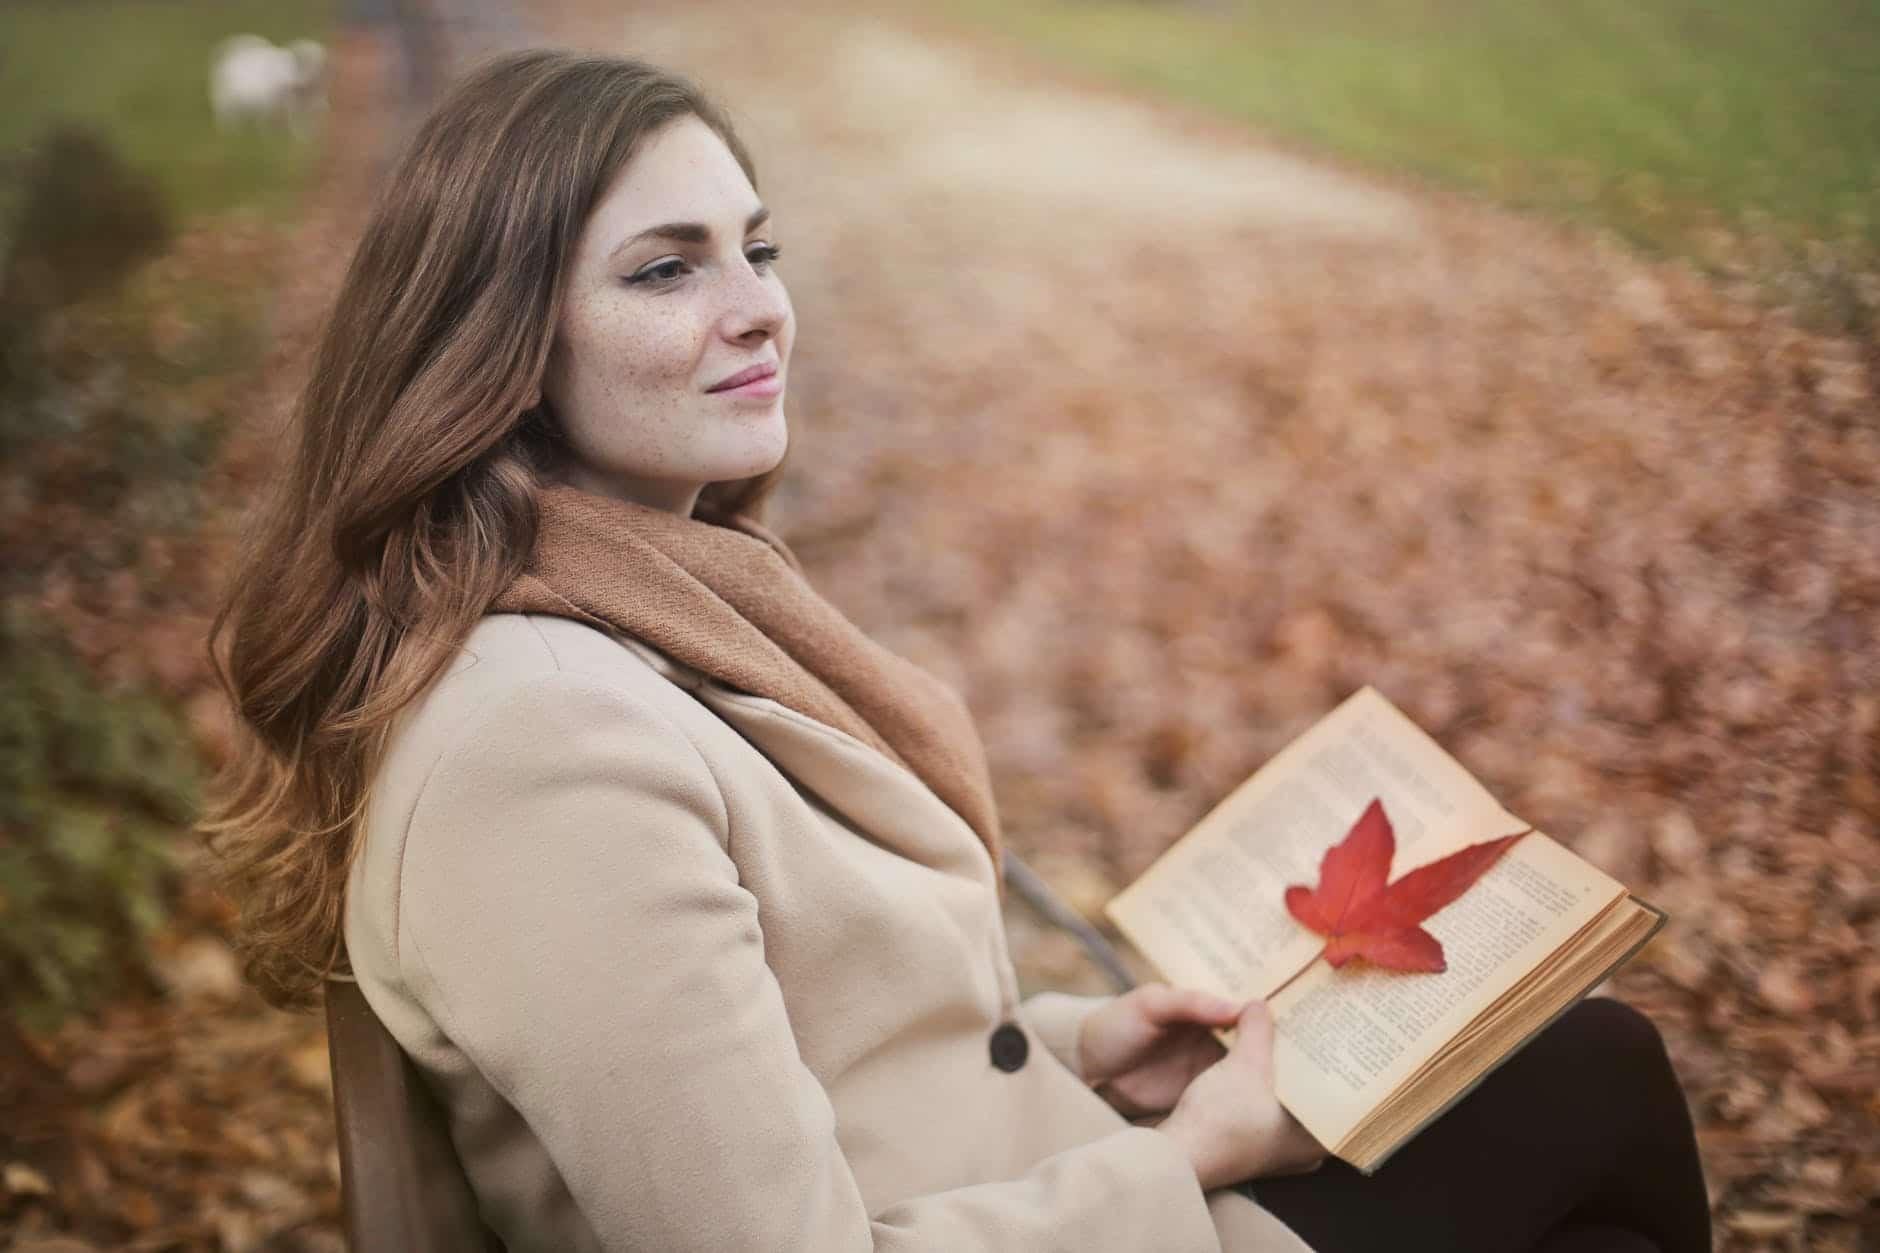 Dare to dream, big dreams as a Christian